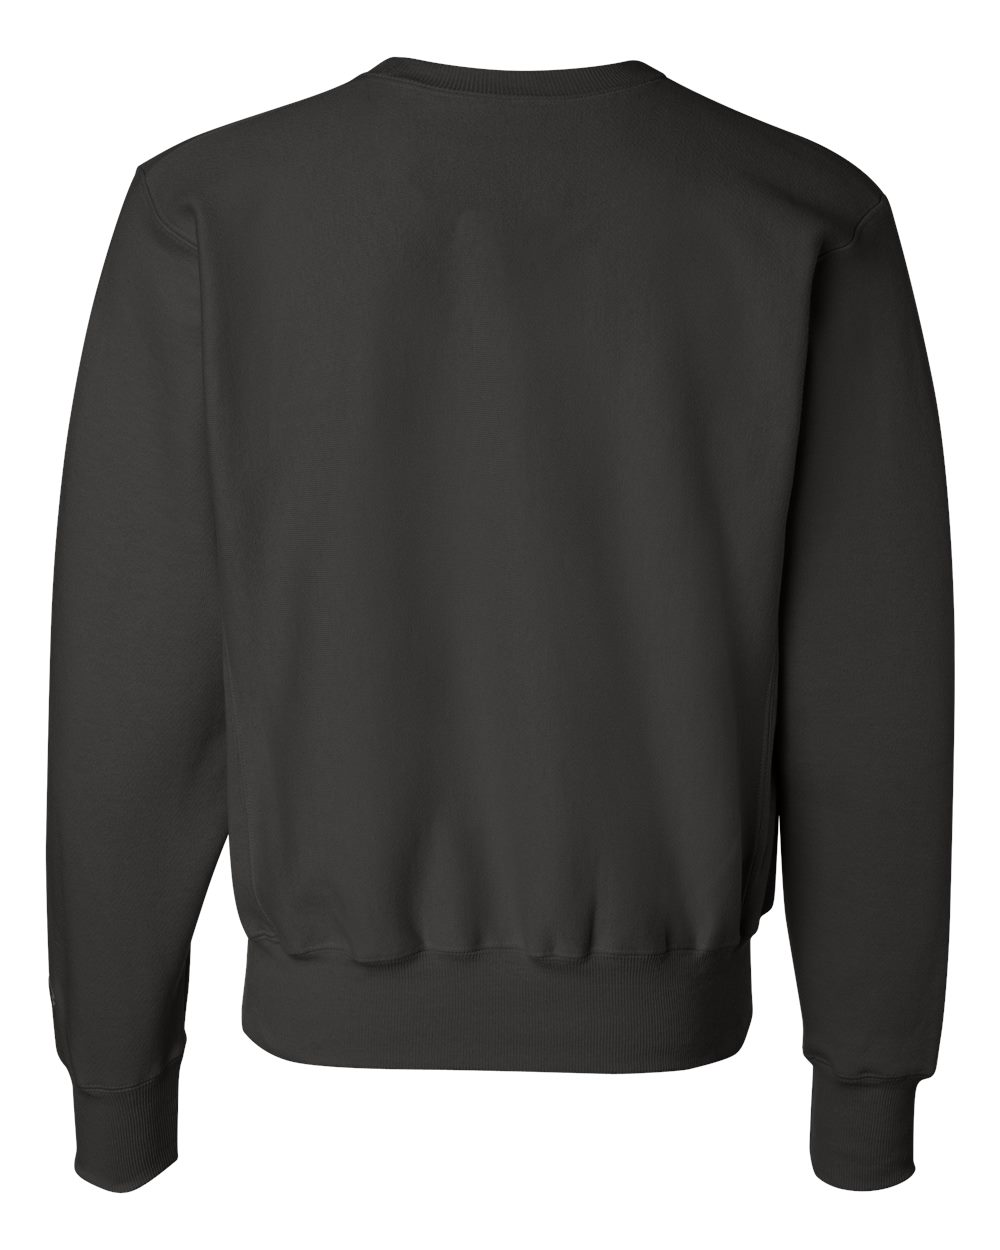 Champion-Mens-Reverse-Weave-Crewneck-Sweatshirt-Blank-Solid-S149-up-to-3XL thumbnail 10